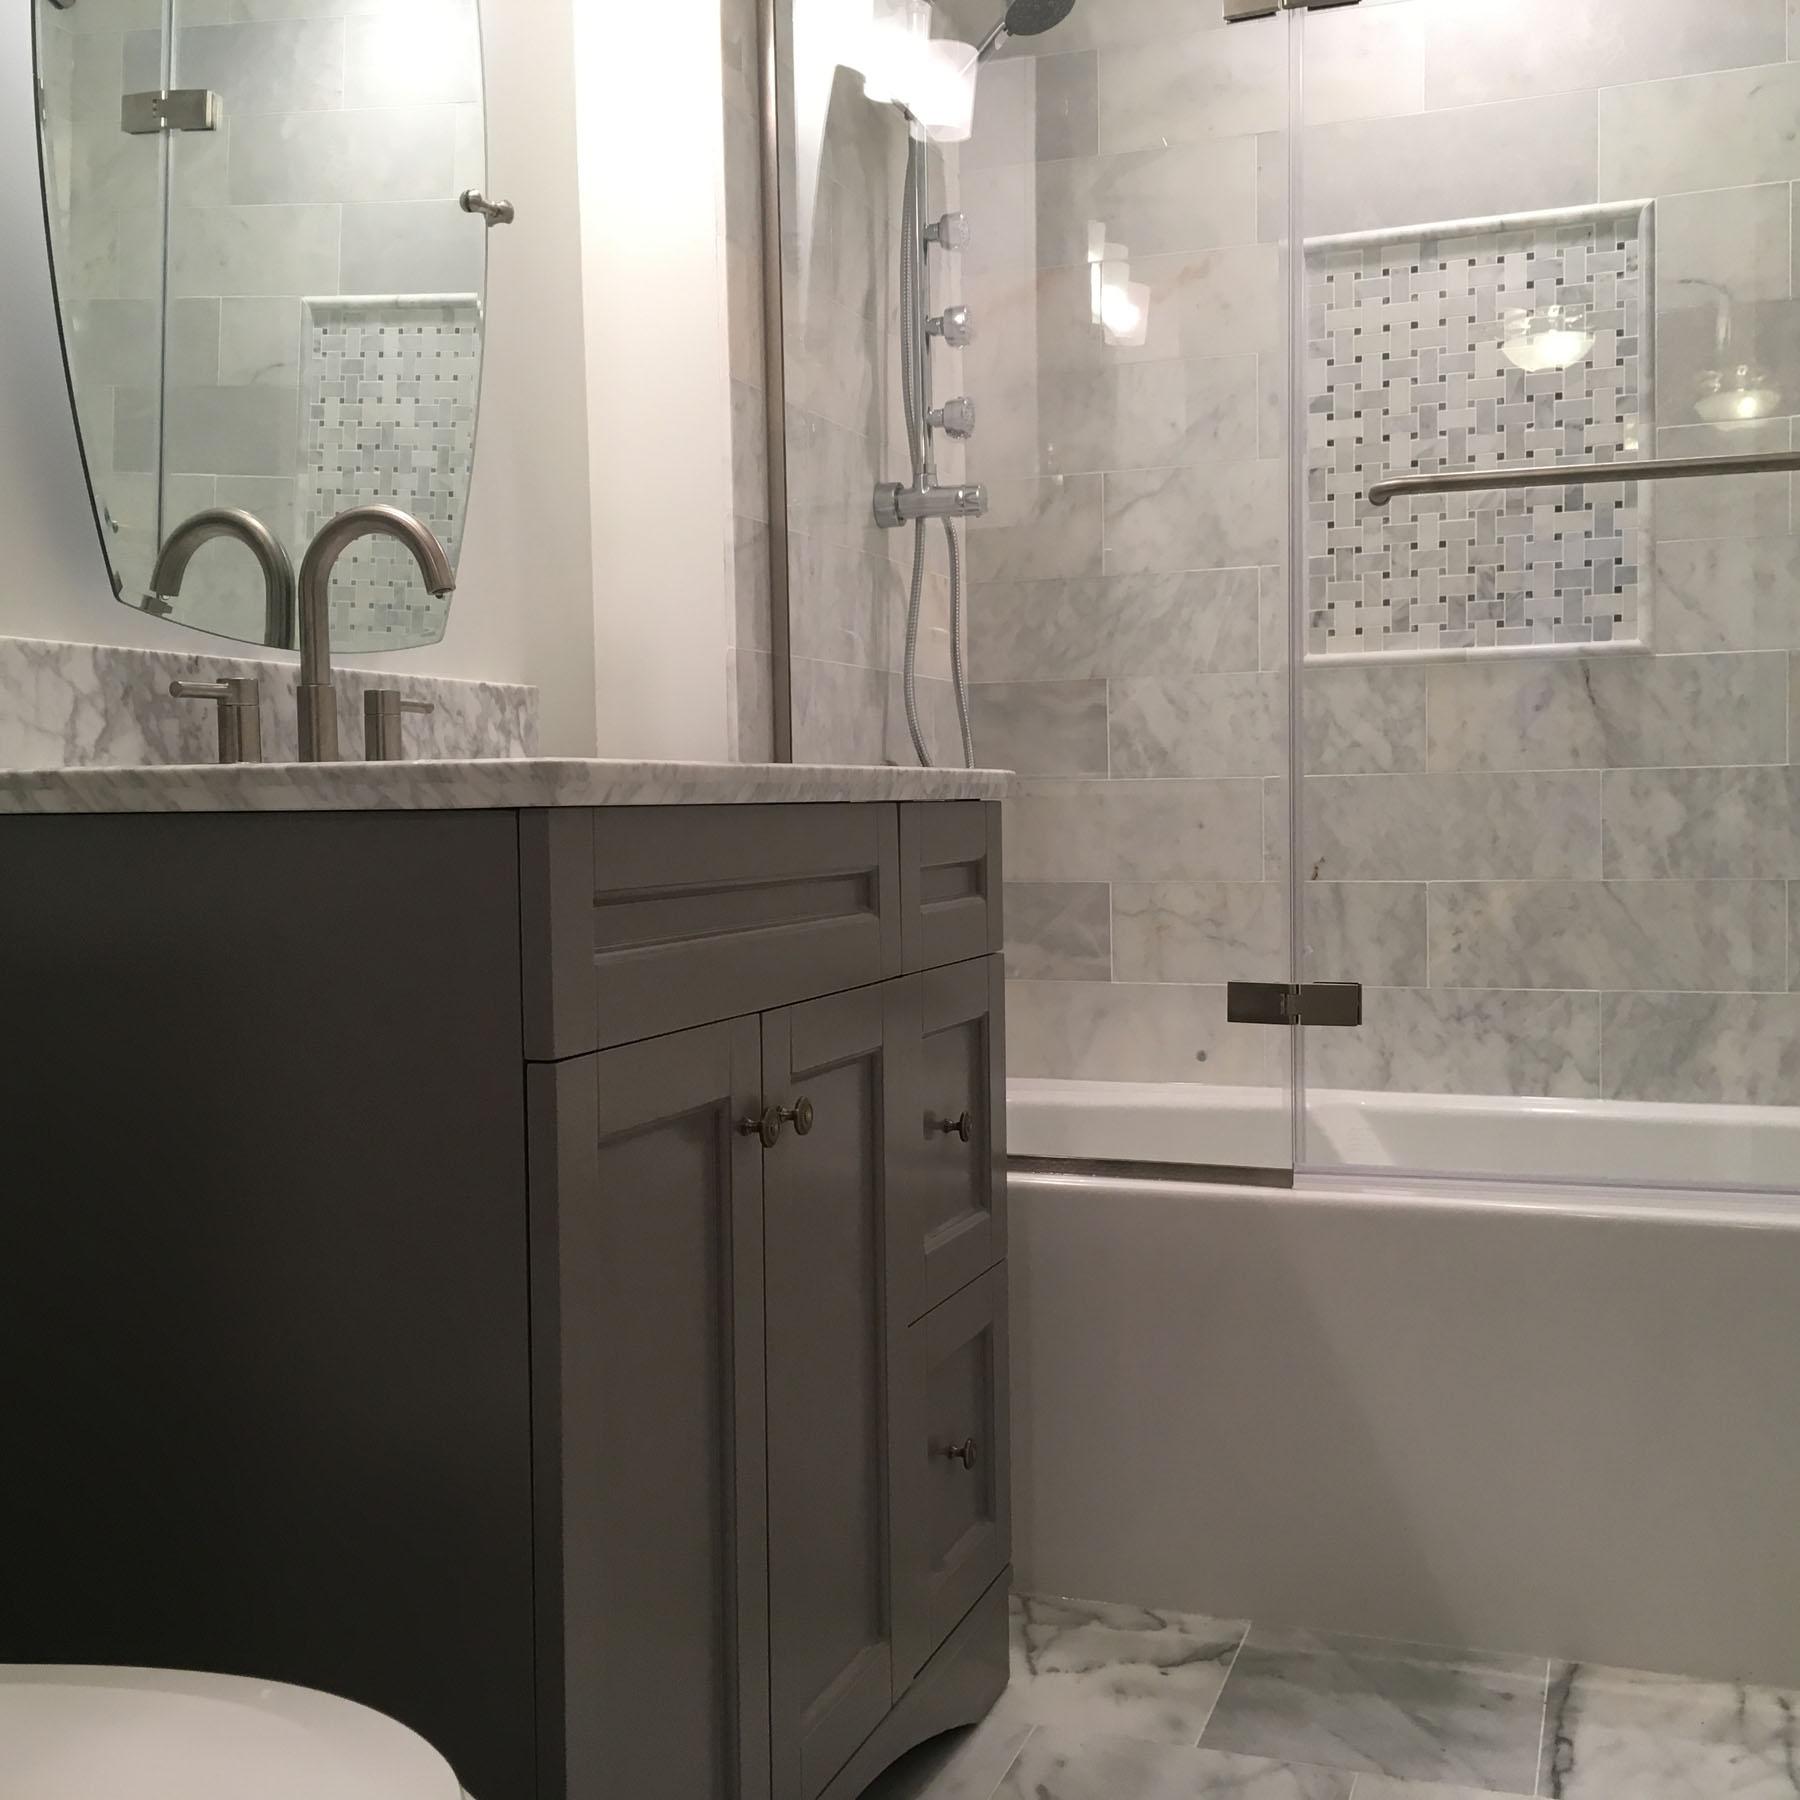 Bathroom remodeling in elmhurst sunny construction for Bath remodel gurnee